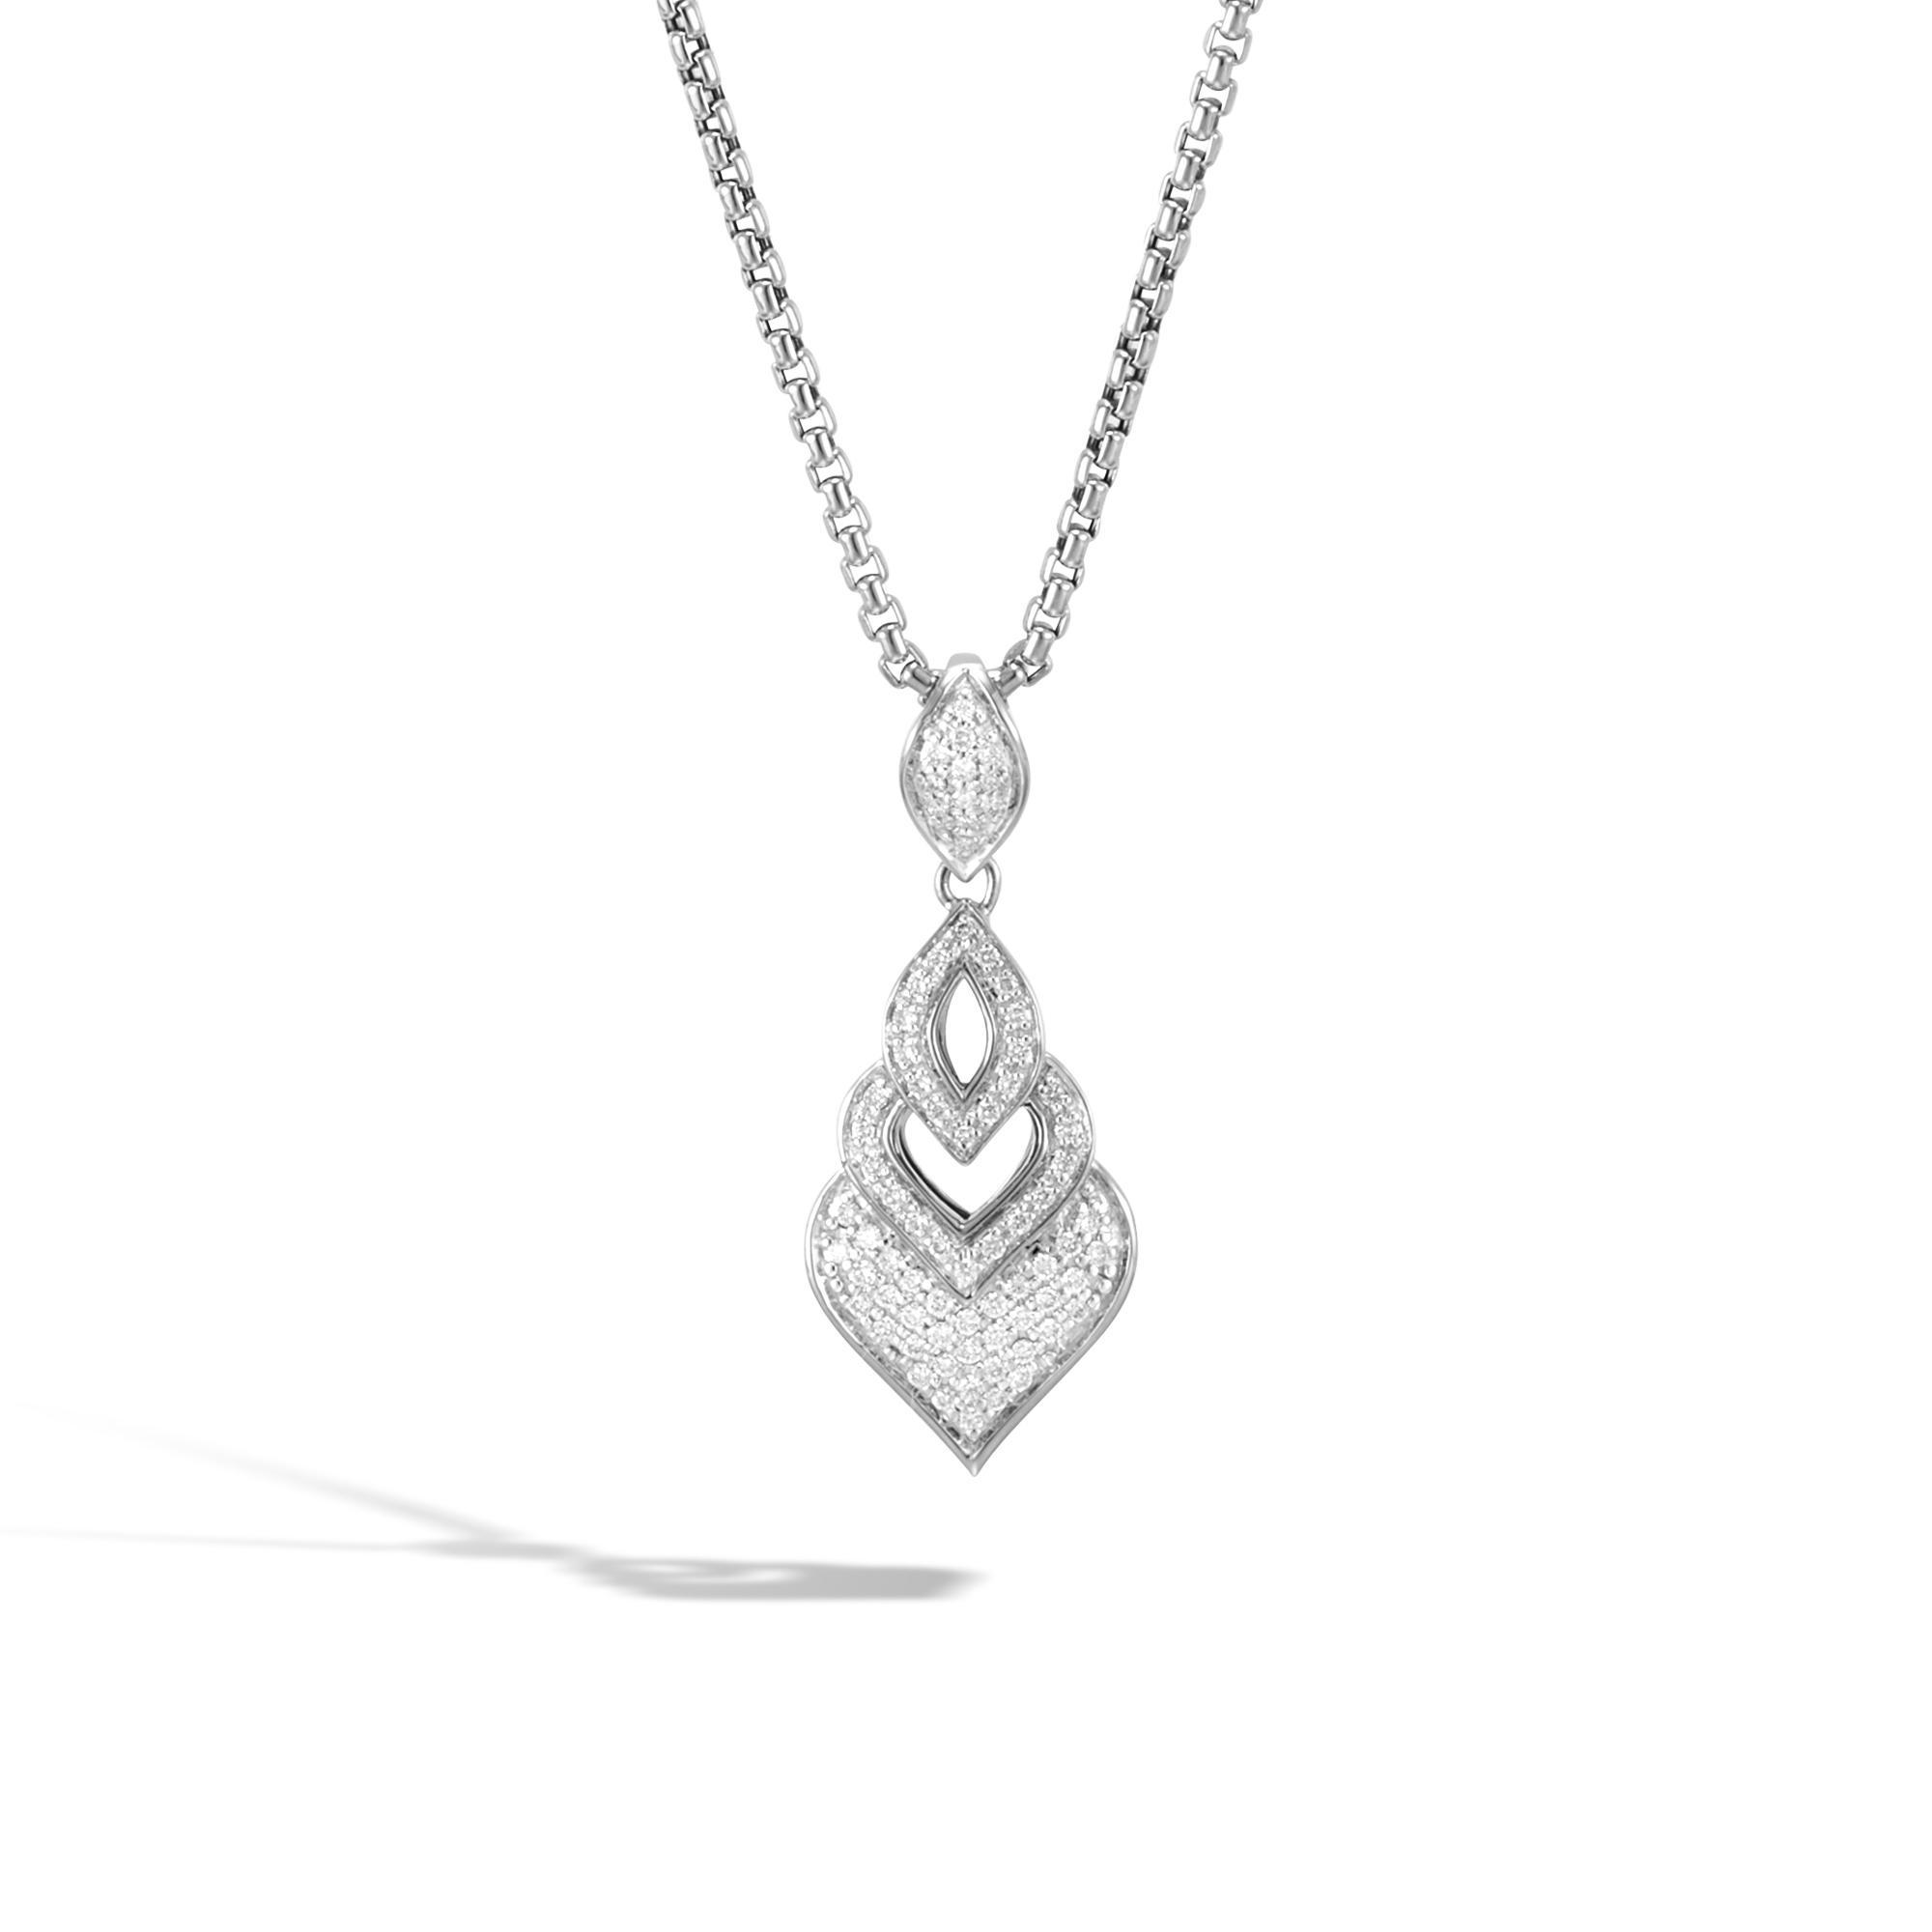 John Hardy Naga Lariat Necklace, Labradorite And Diamonds